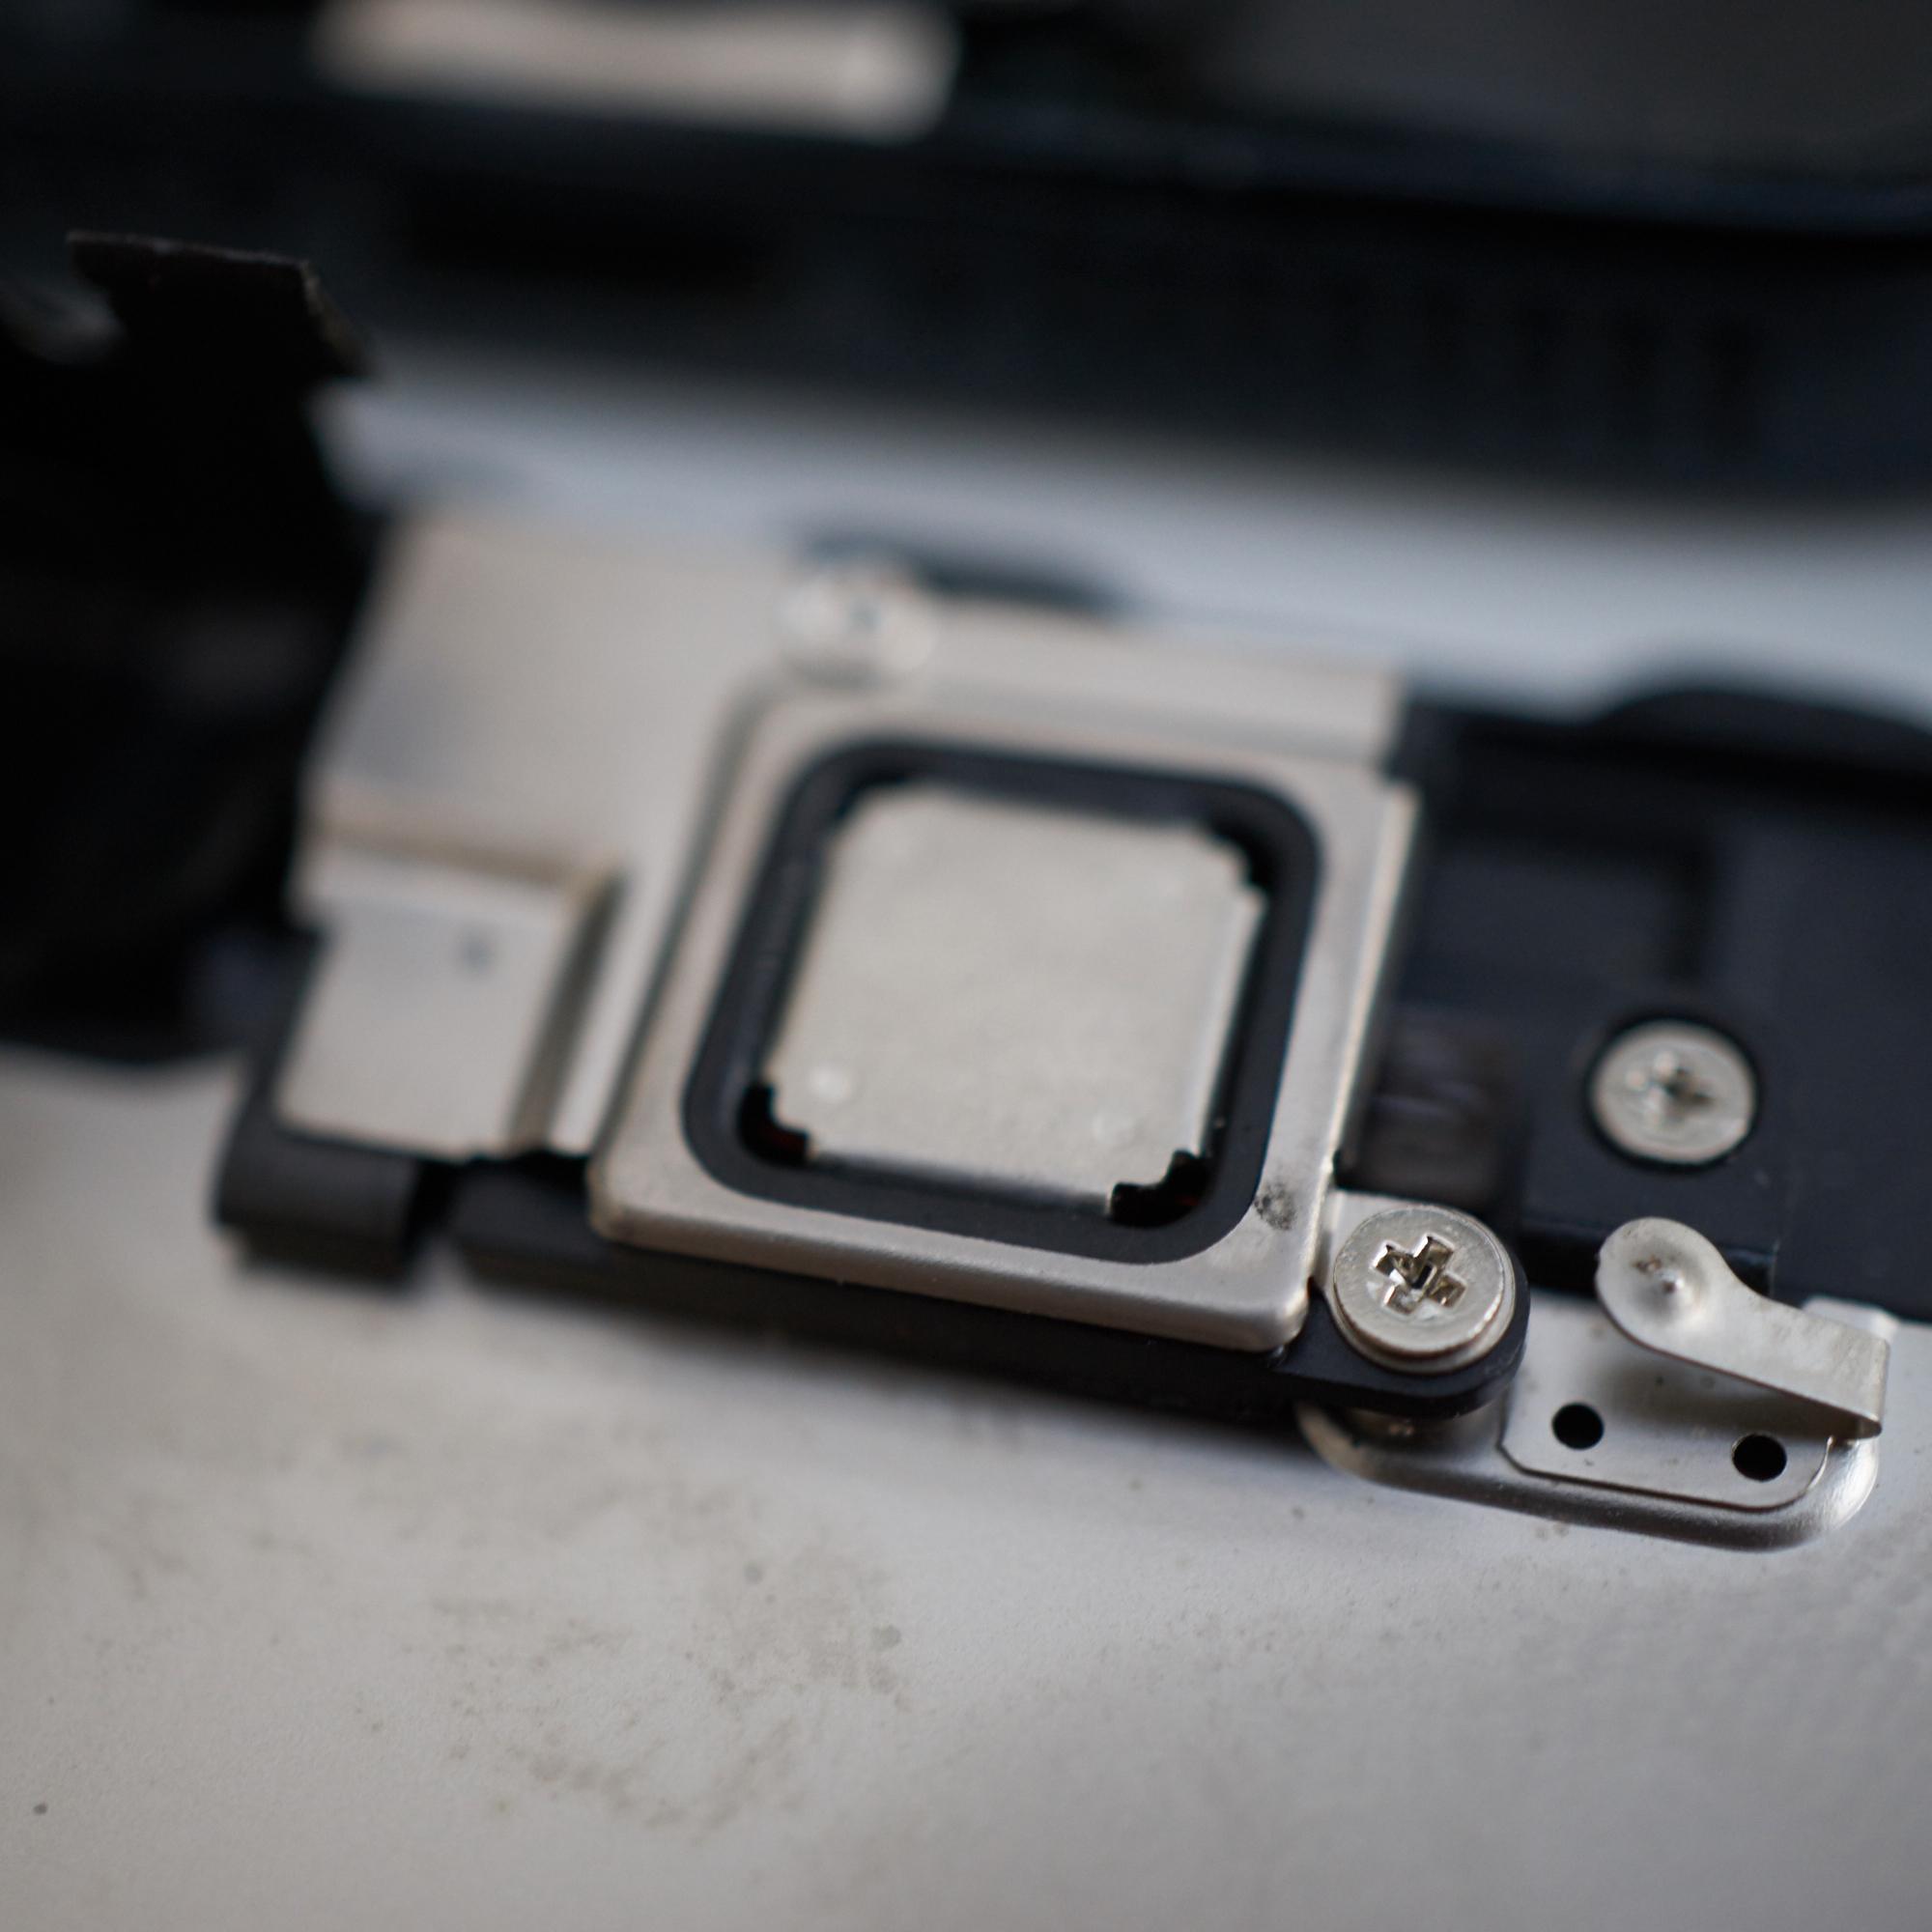 Frontkamera-assembly, iPhone 5.